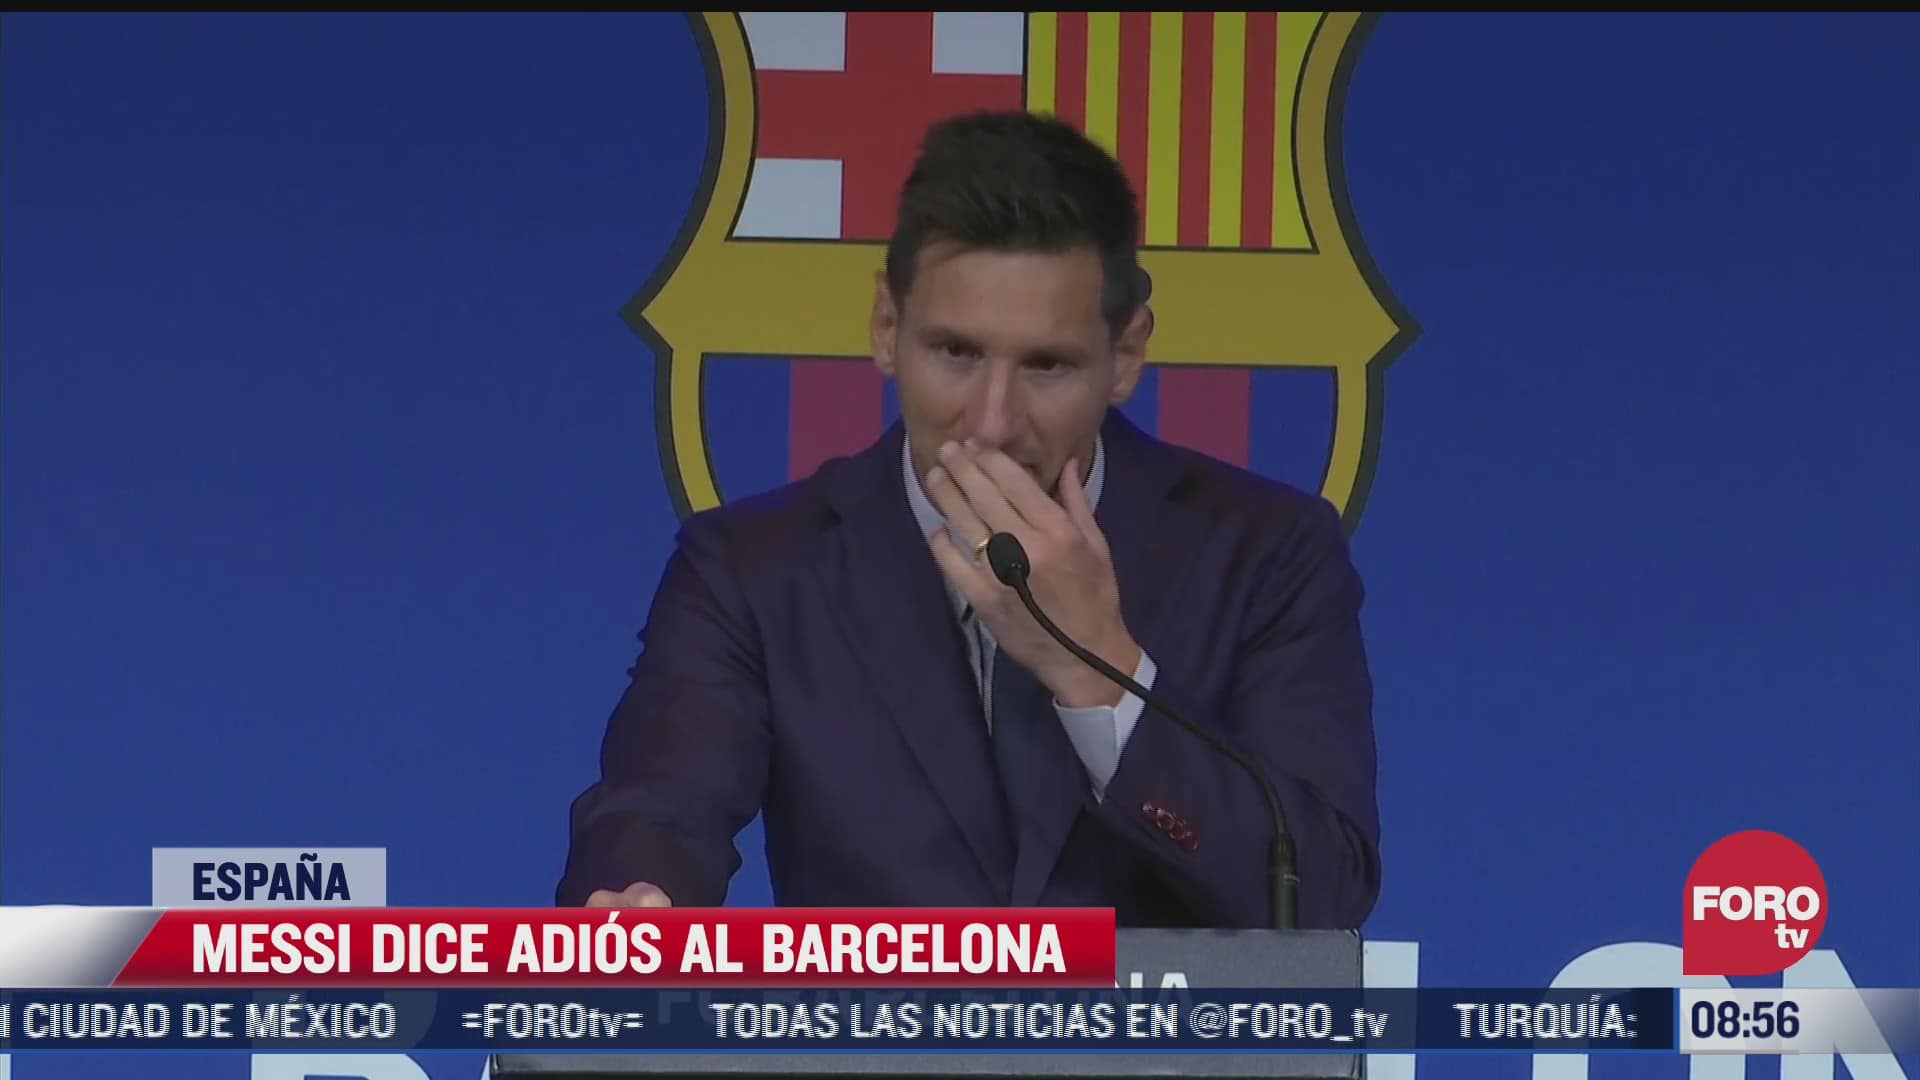 llorando lionel messi dice adios al barcelona